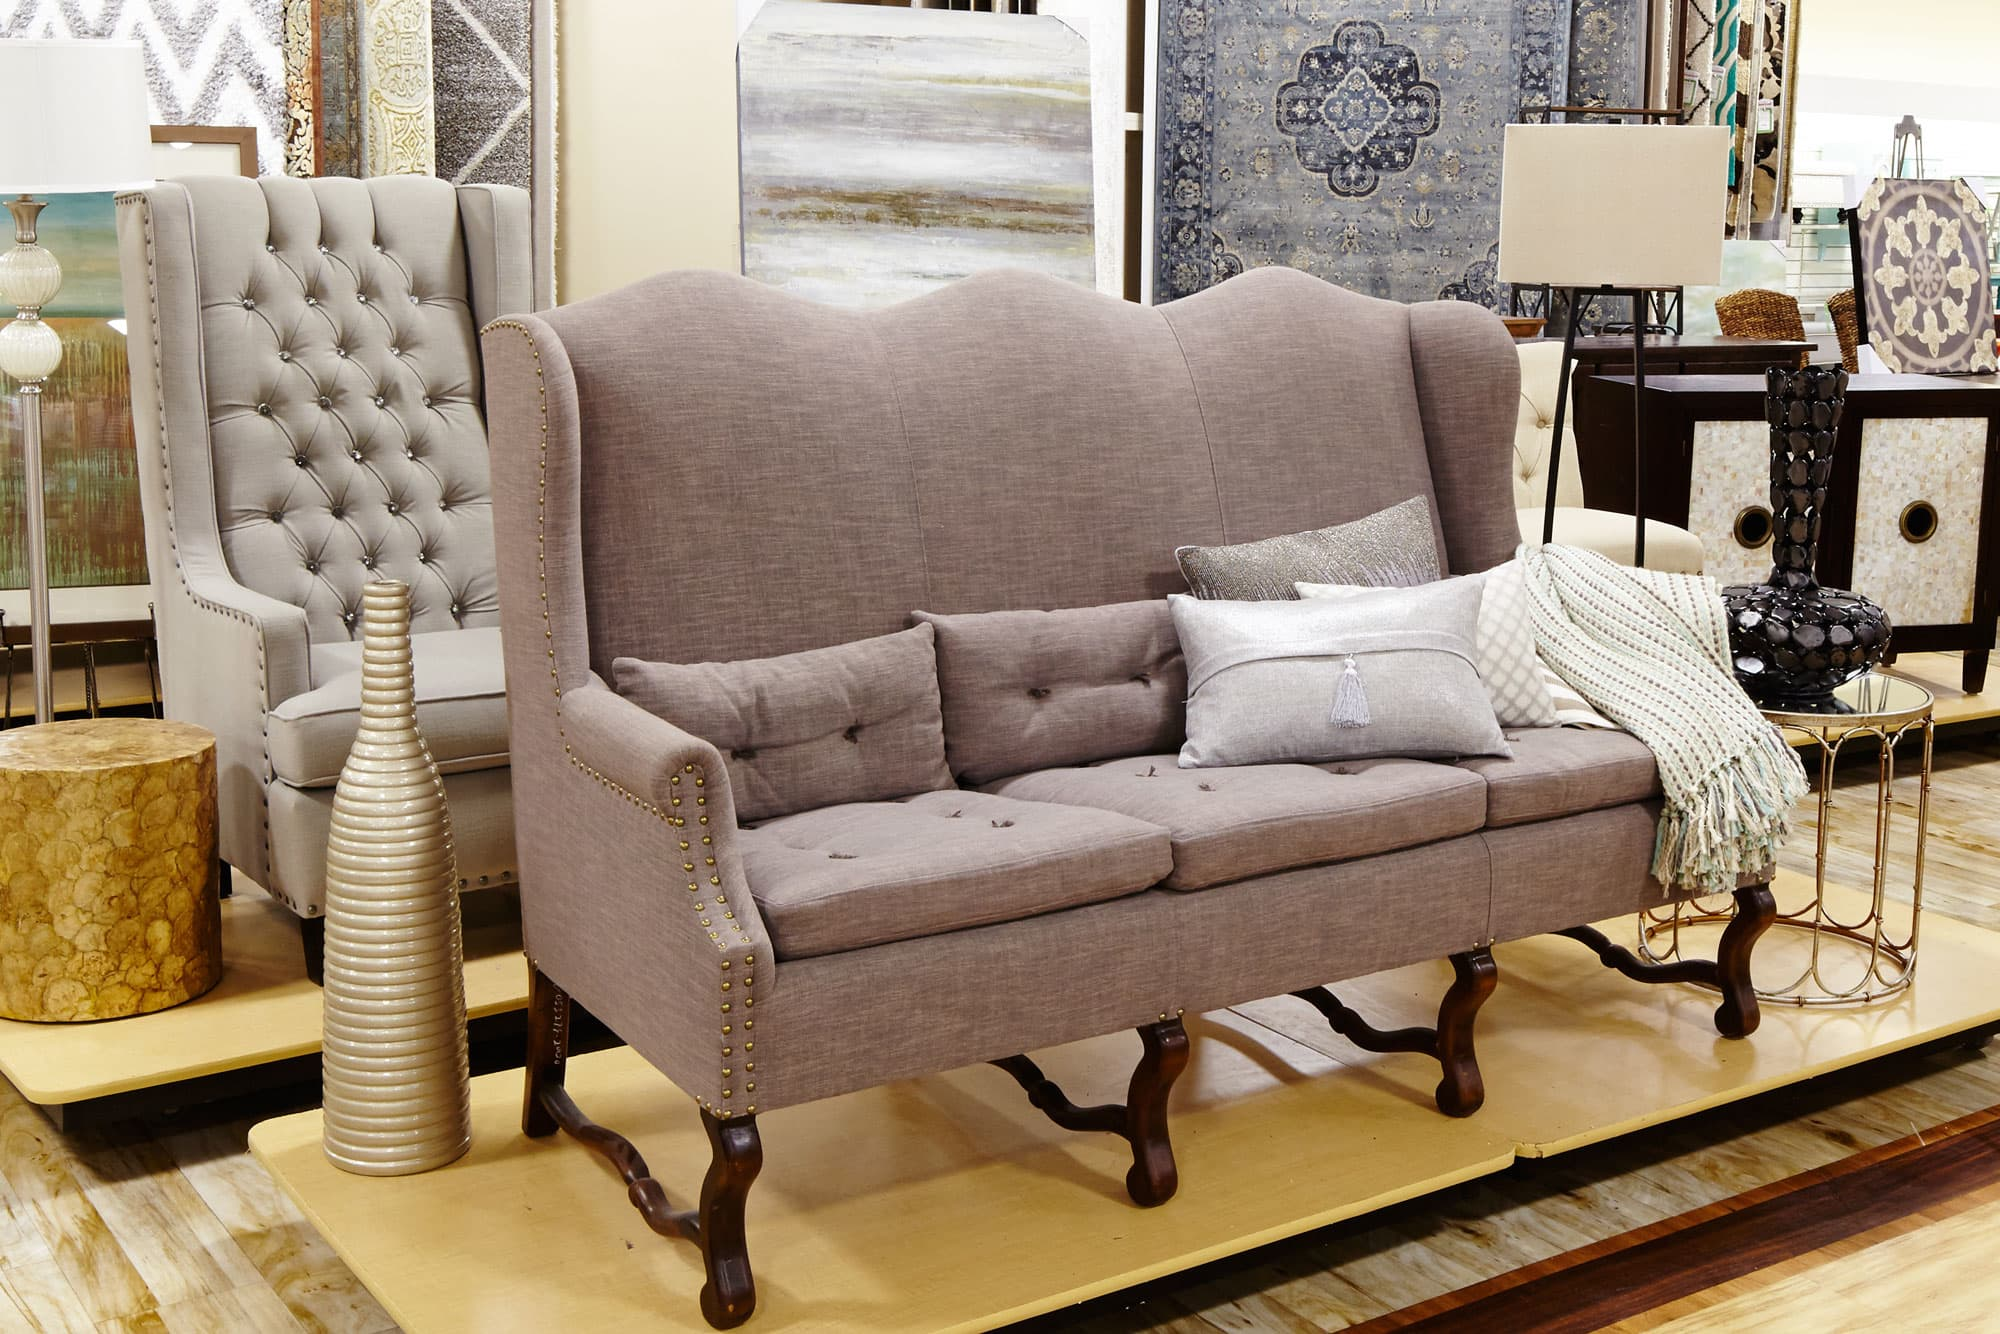 Home Goods Furniture New in House Designerraleigh kitchen